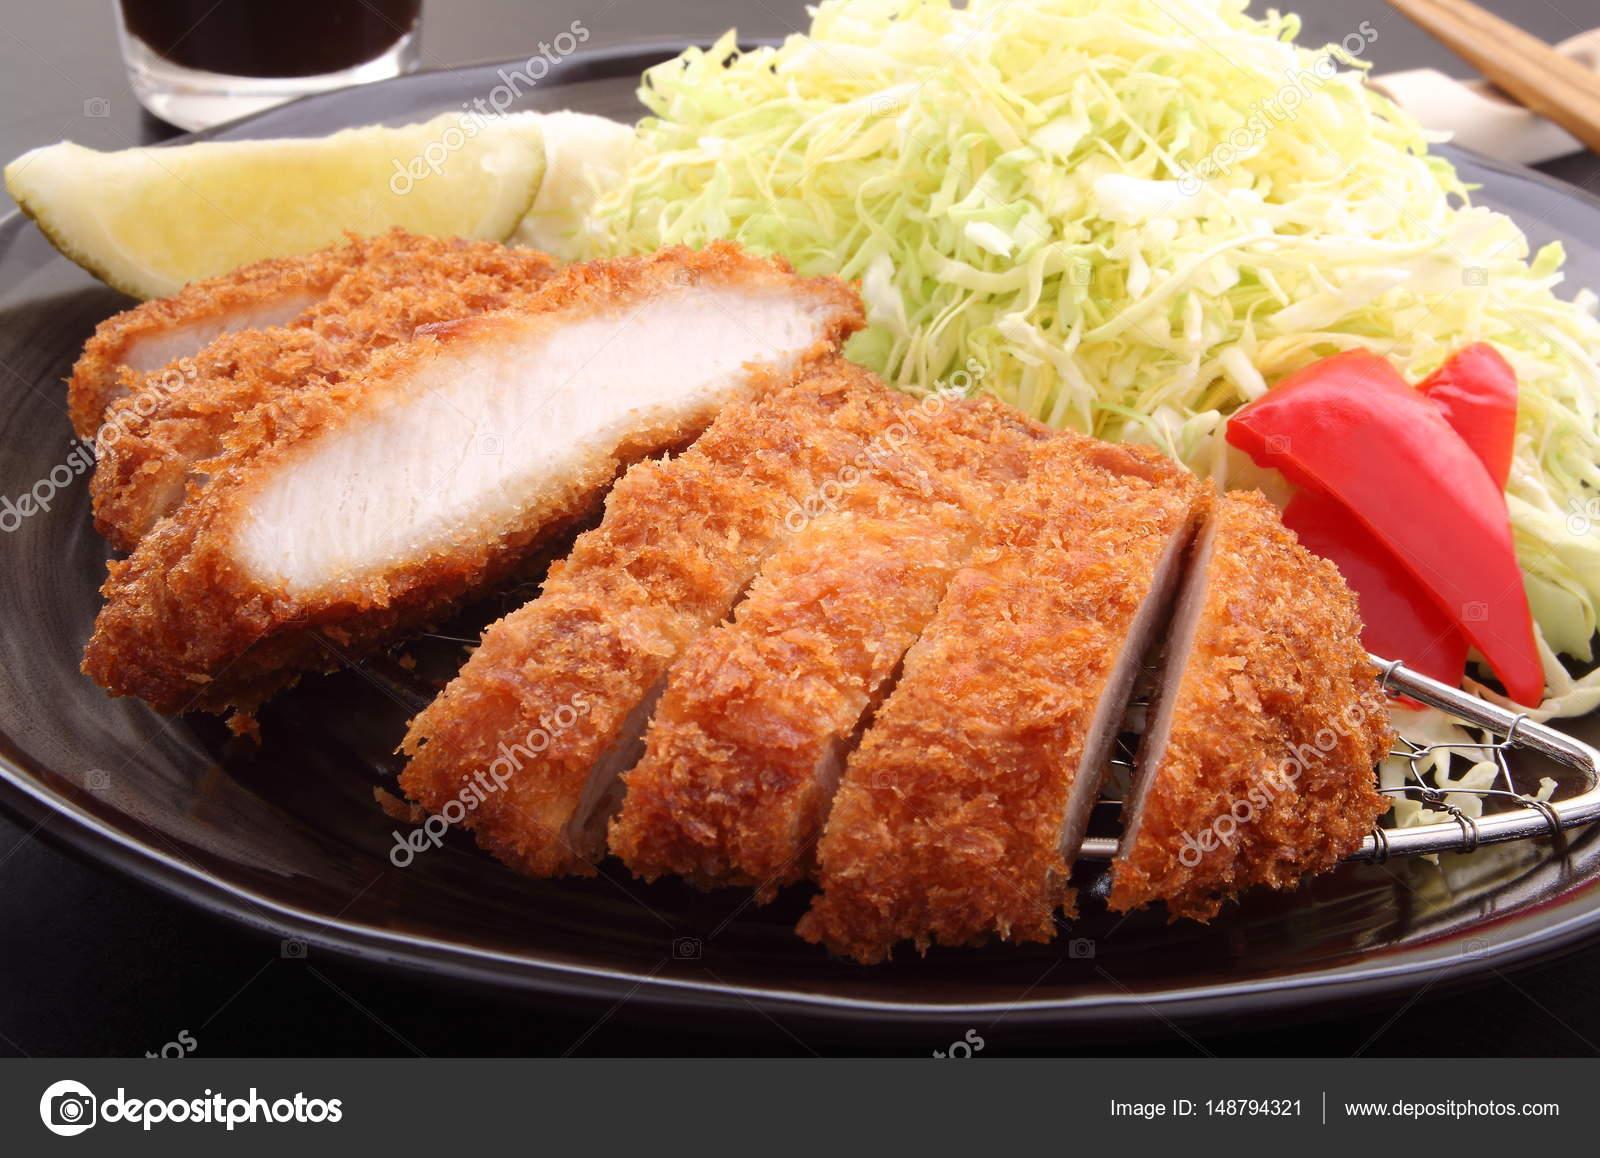 Deep Fried Pork Loin Cutlet With Salad And Lemon Japanese Food Stock Photo